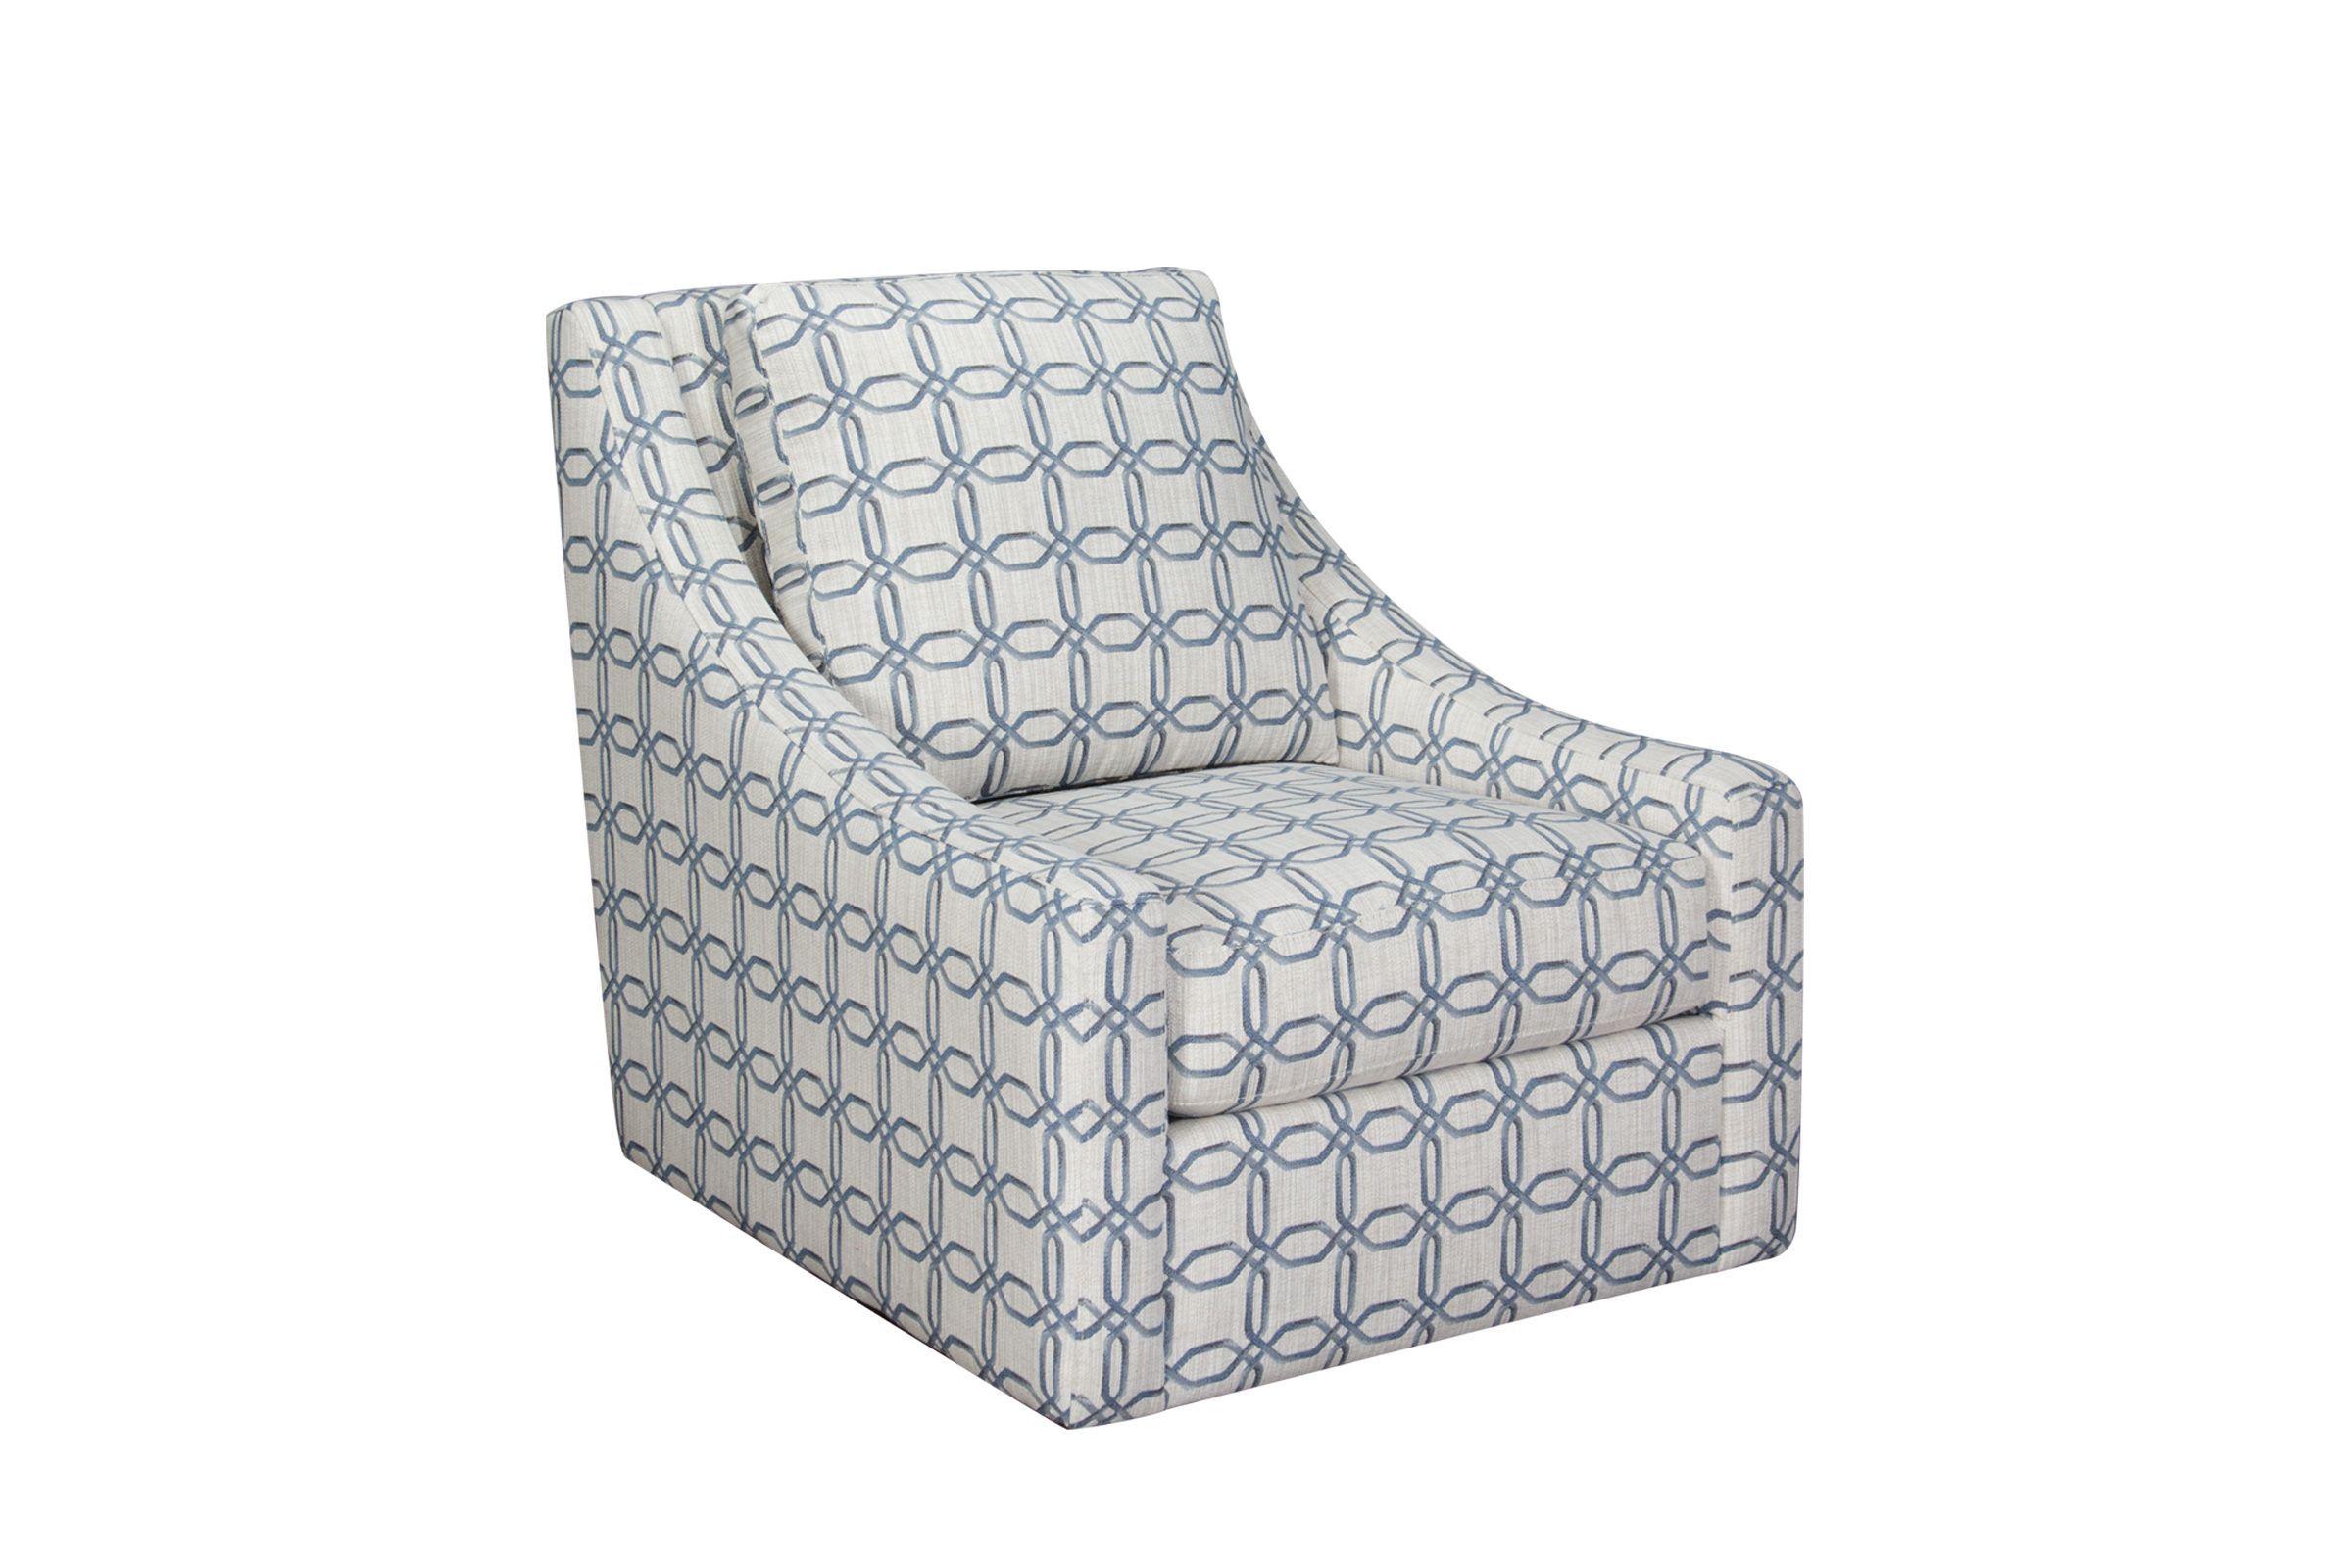 Nora Accent Chair Bauhaus furniture, Buy furniture